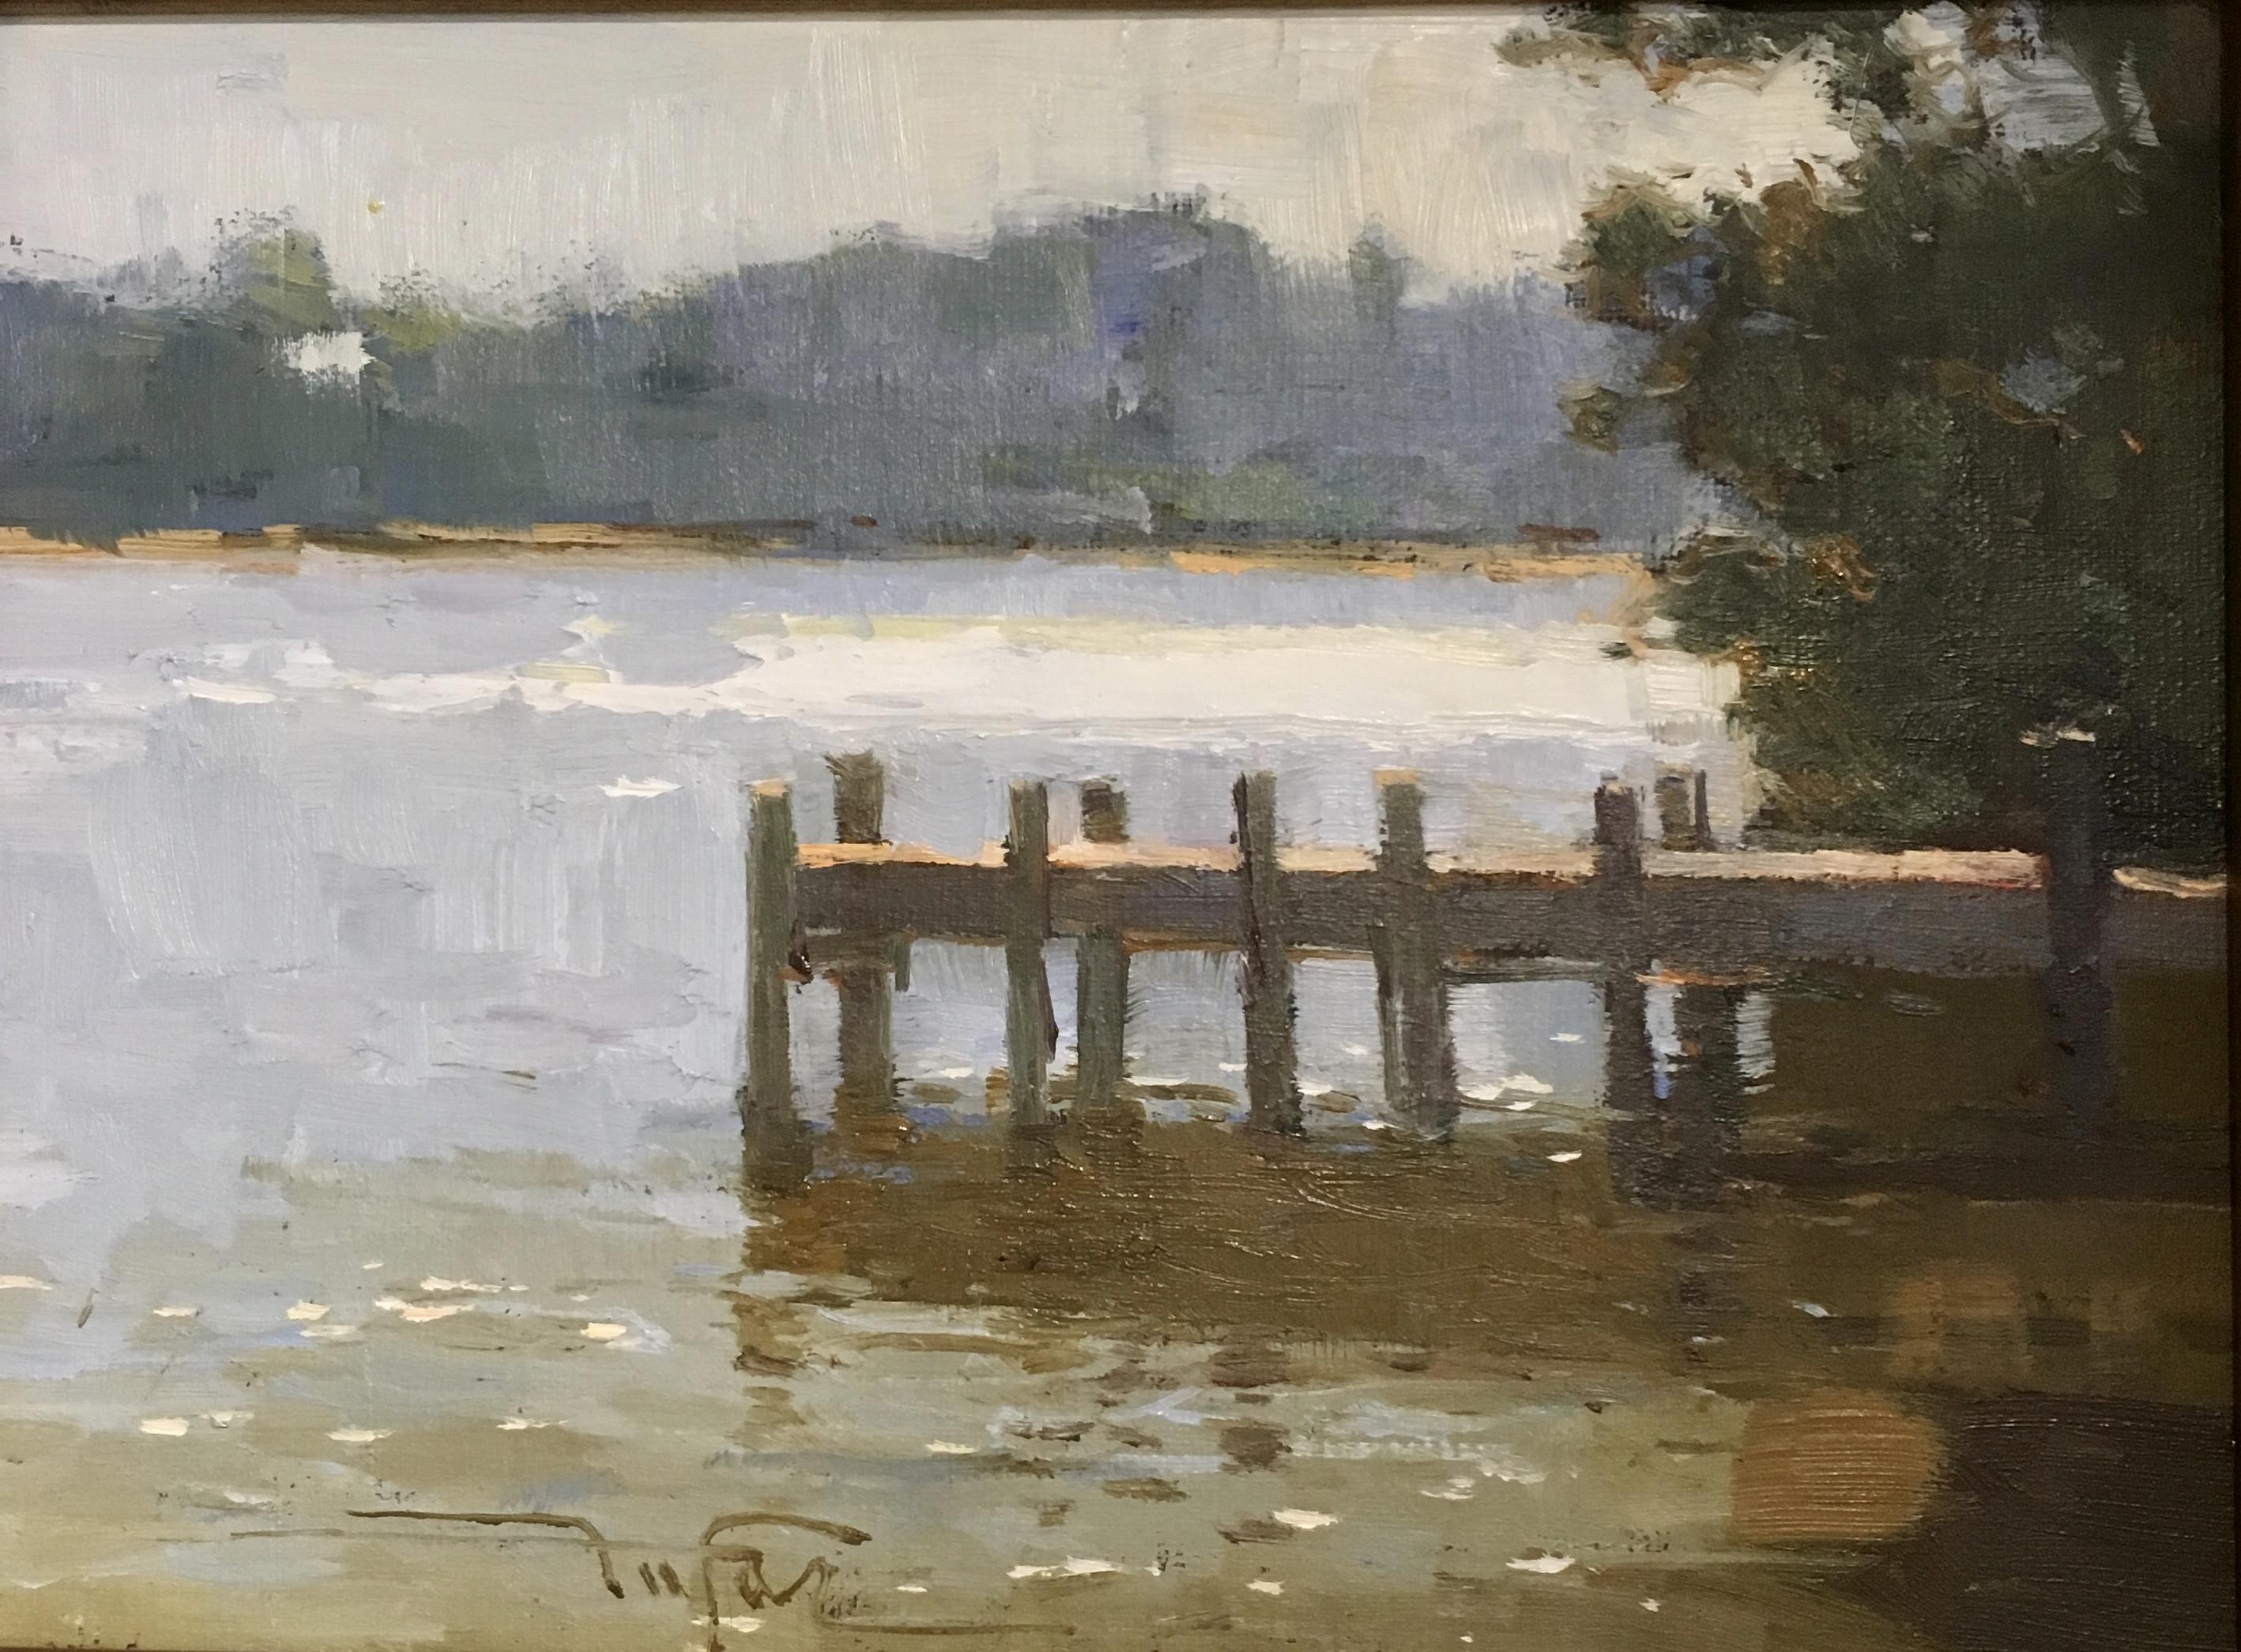 Pine at Water-Bikbov, oil $600 6x8